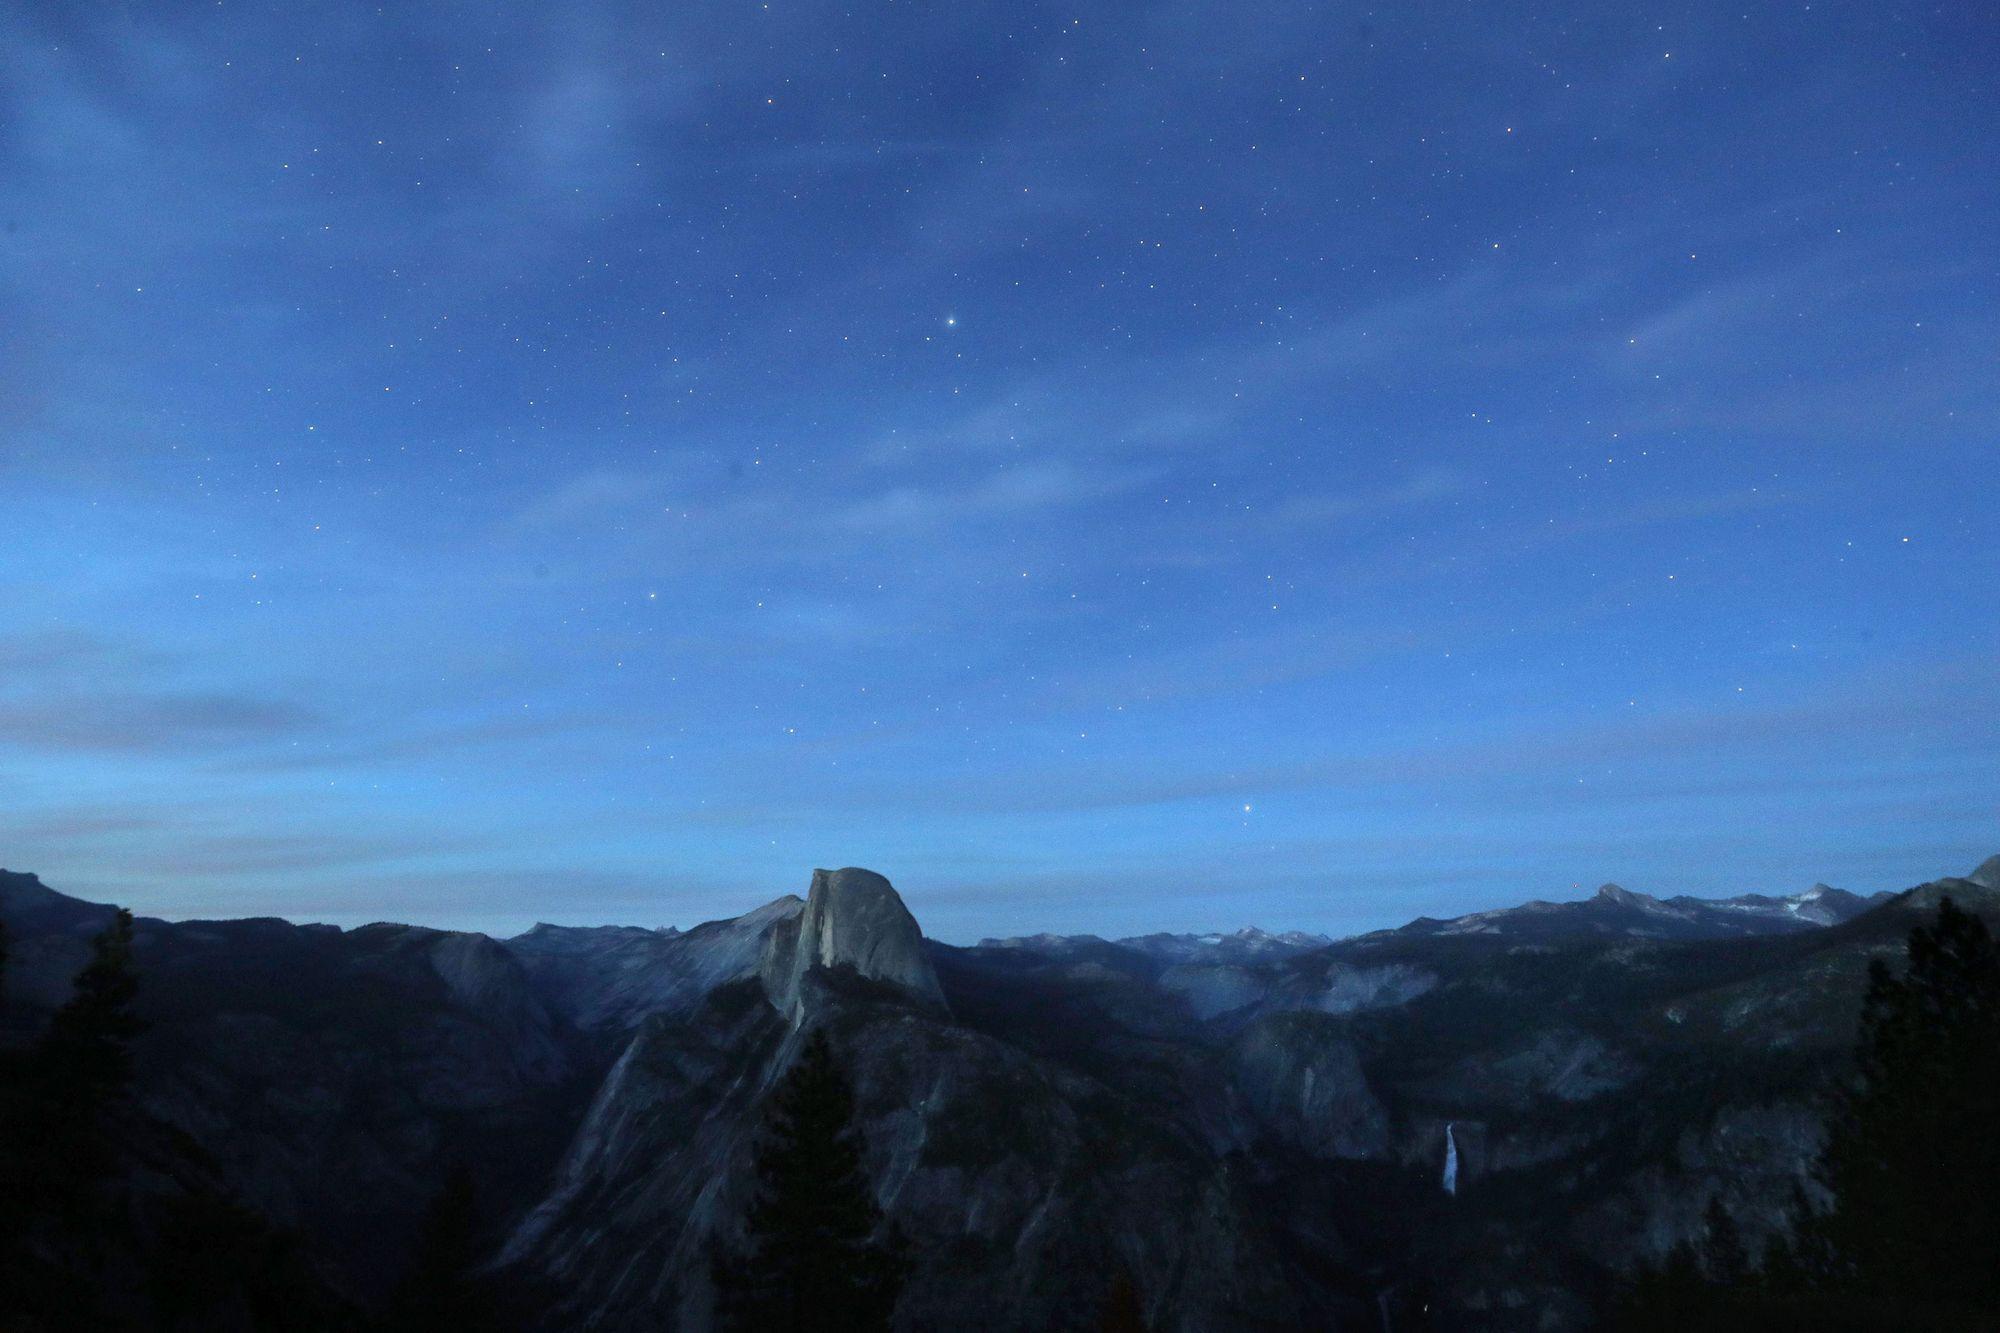 Video: Skiing Duo Descends Treacherous, Spin-Tingling Shoulder of Yosemite's Half Dome